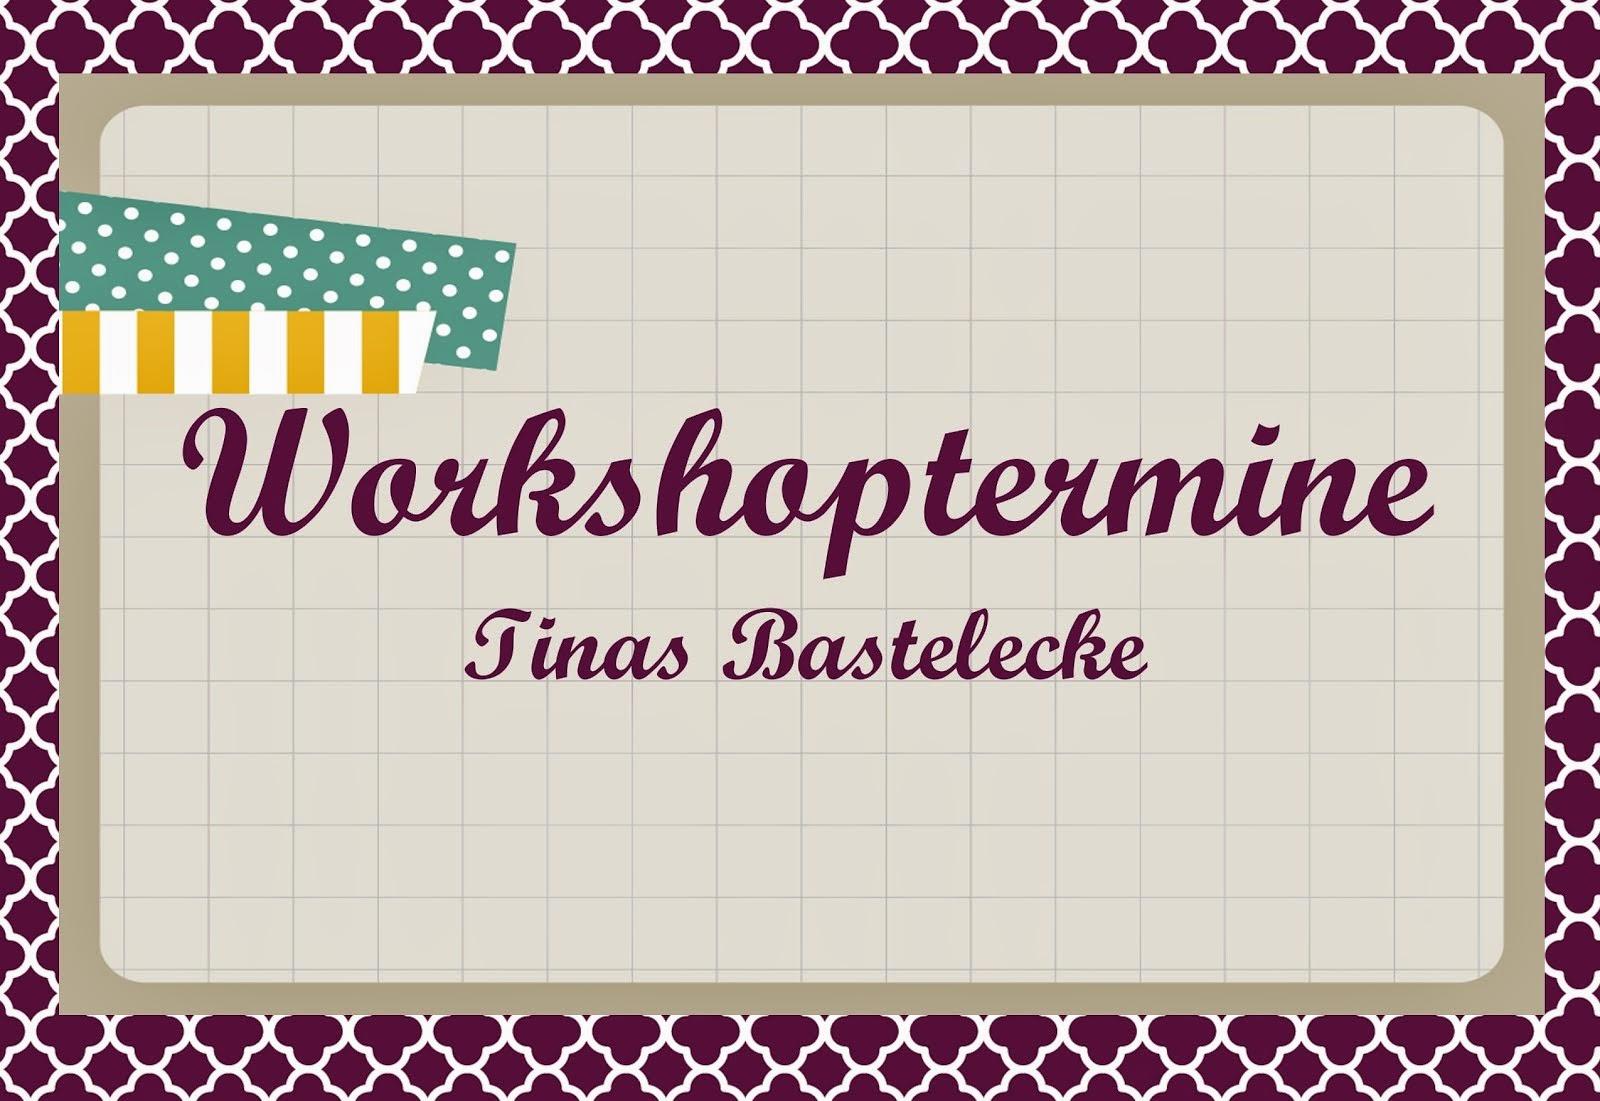 Workshop-Termine